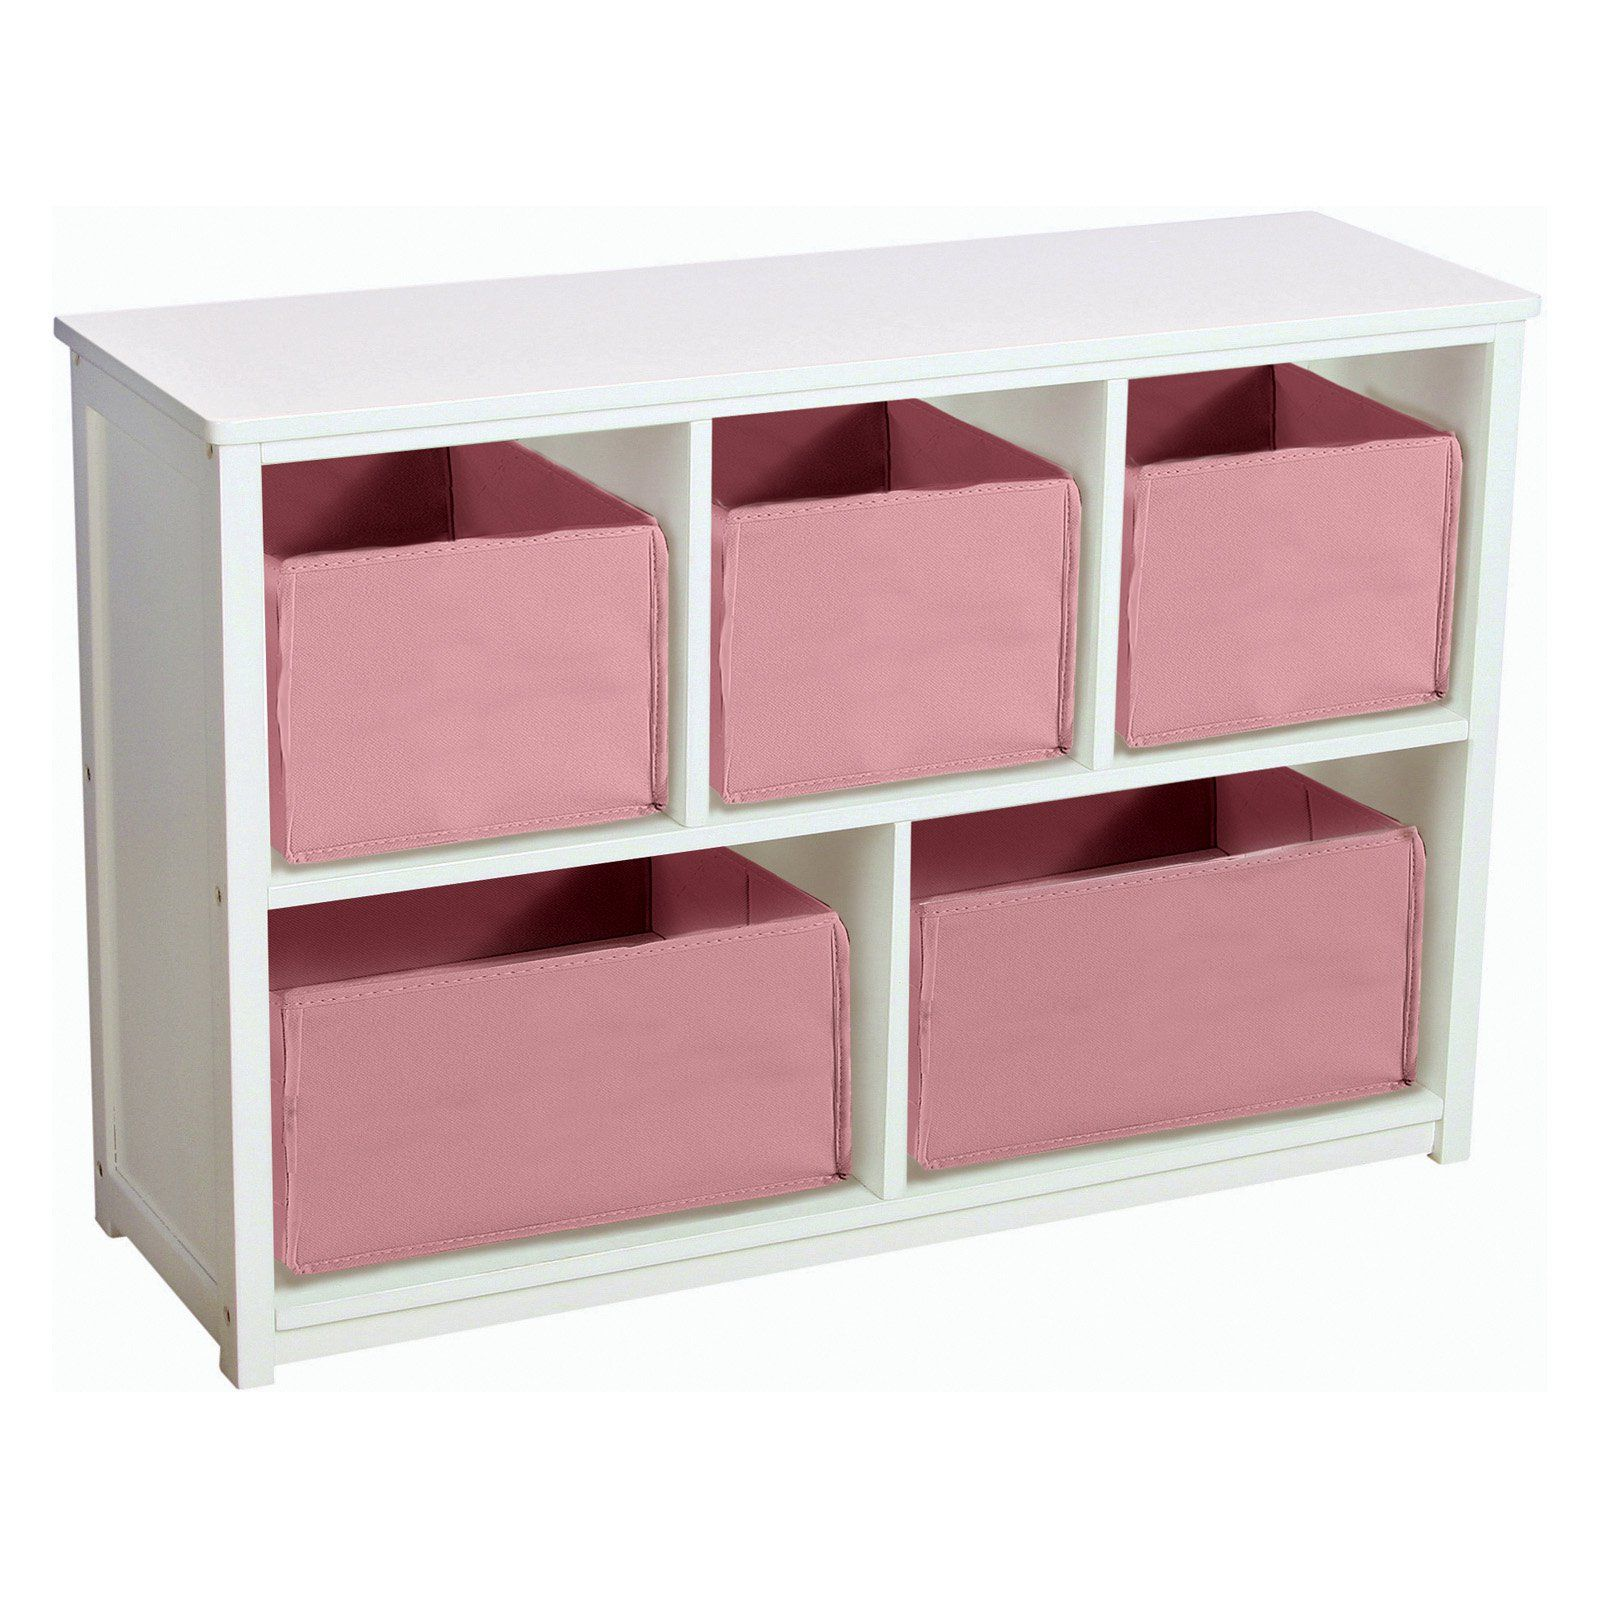 Guidecraft Classic White Bookshelf with Optional Baskets